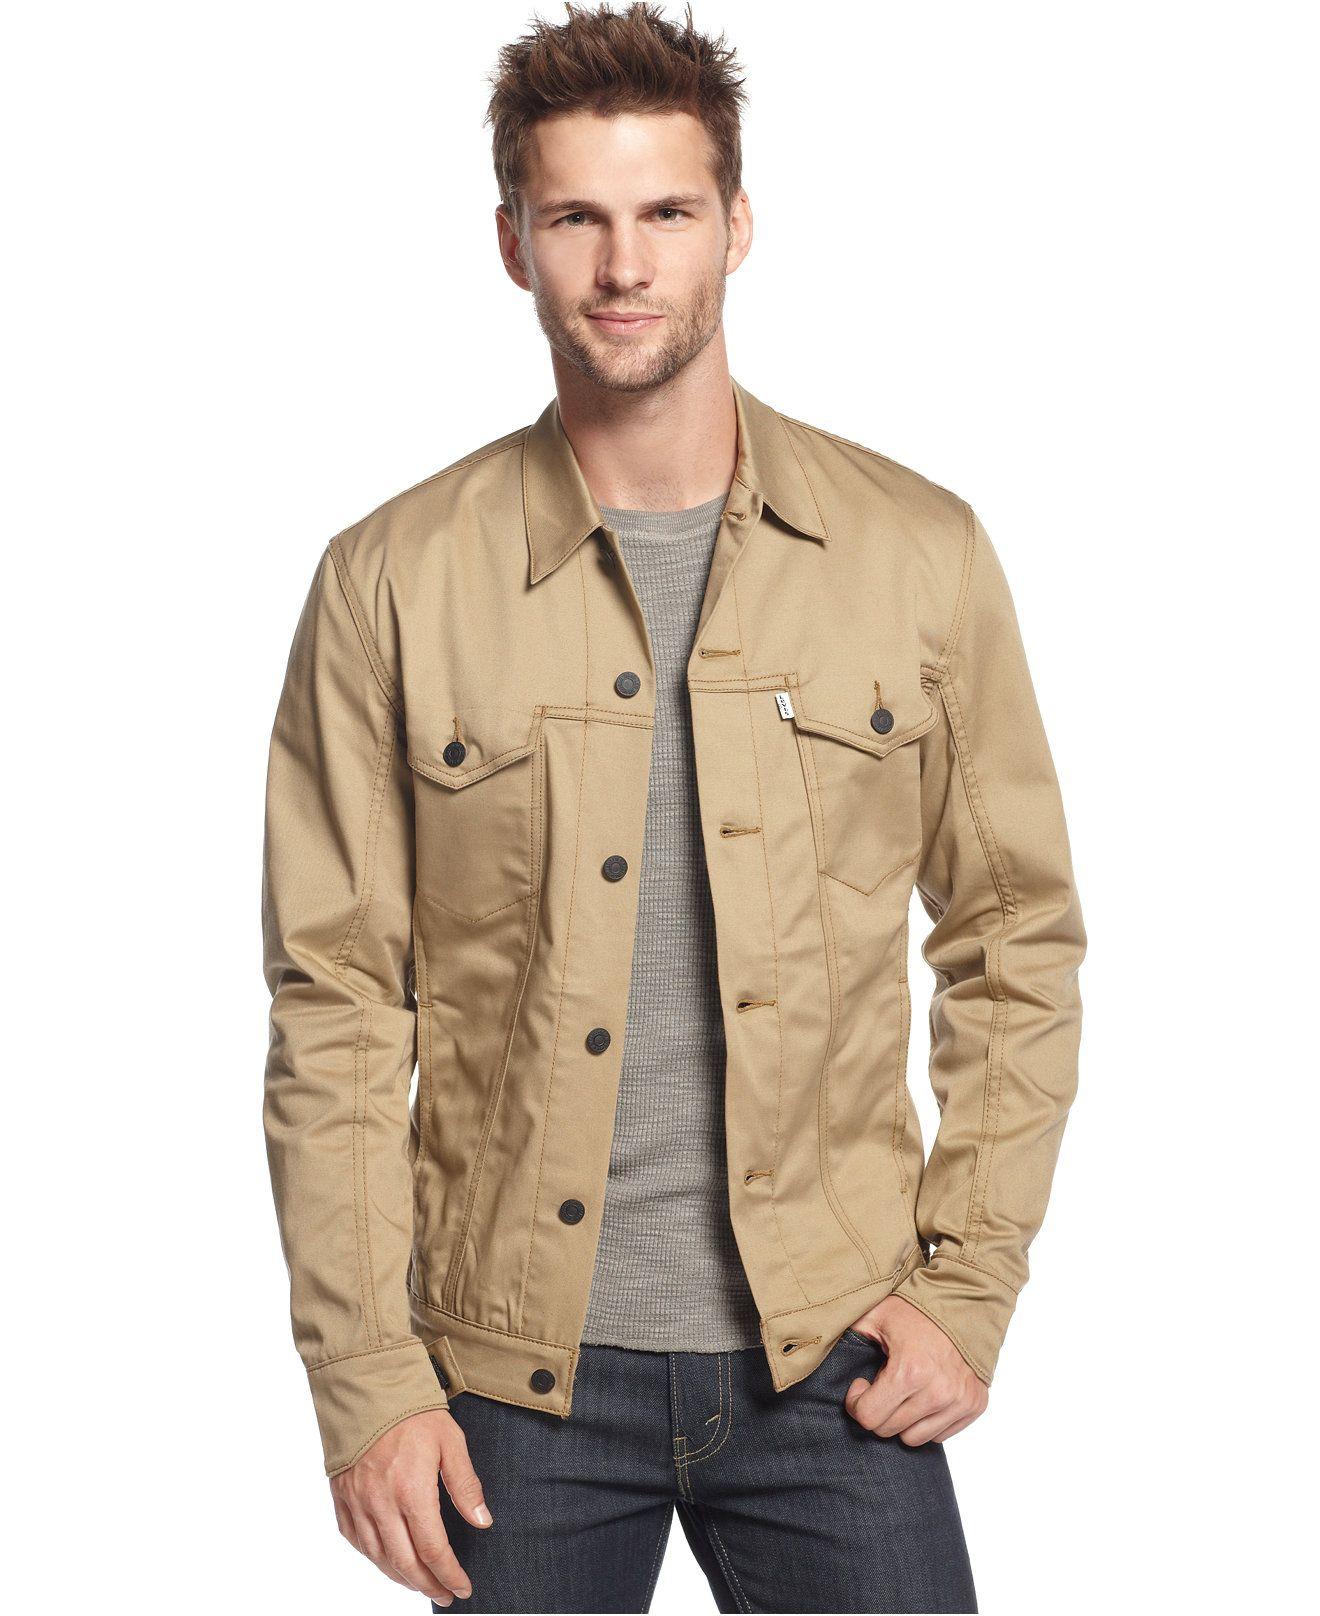 Mens khaki jacket casual - Levi S Commuter Harvest Gold Twill Trucker Jacket Coats Jackets Men Macy S